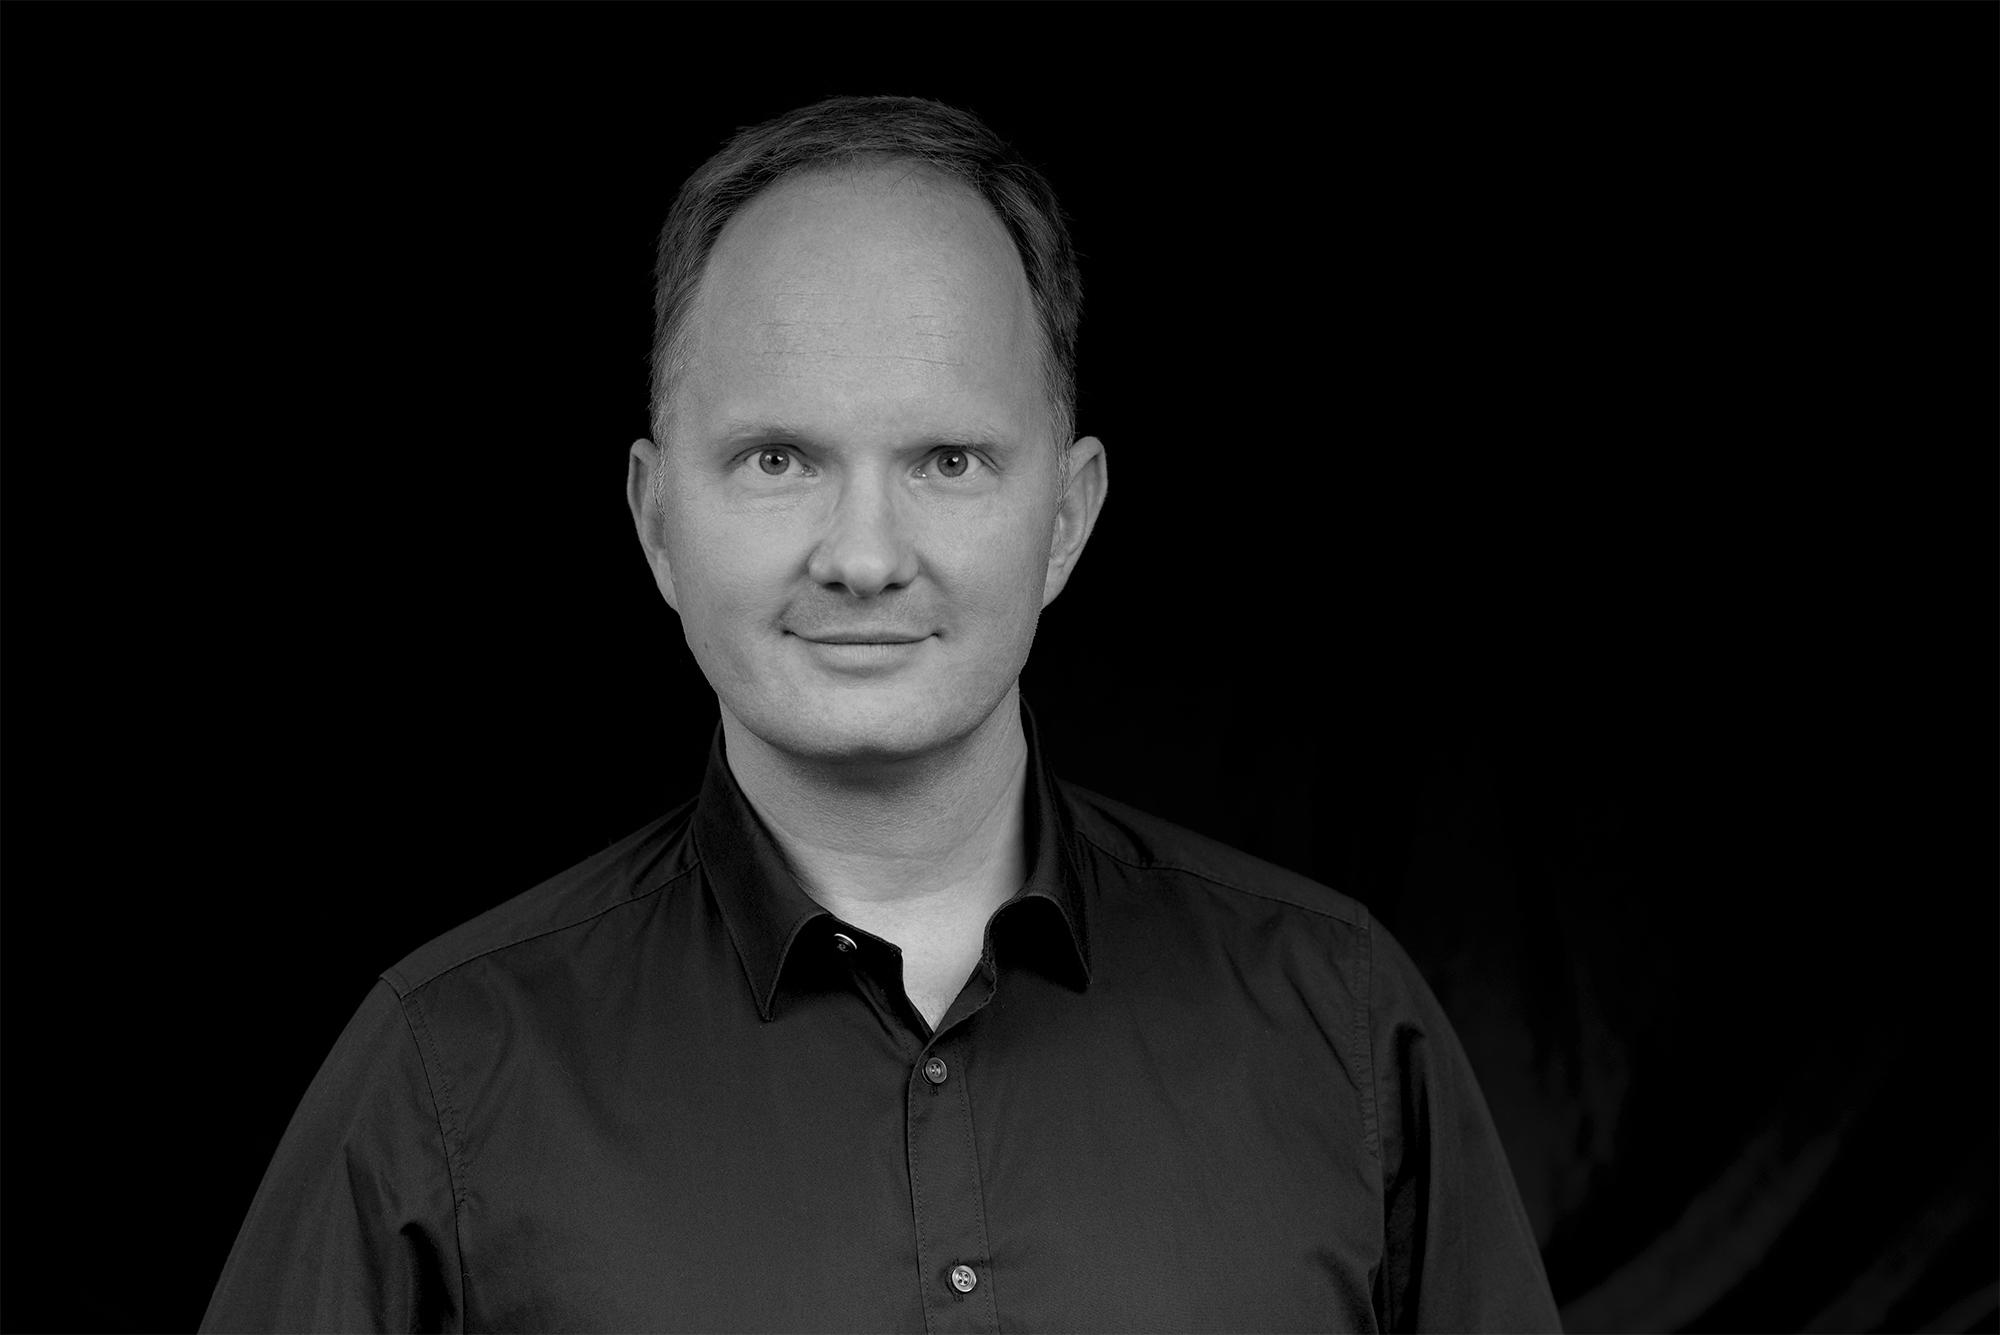 Dr._Björn_Momsen_Chief_Financial_Officer_3 - Petra_Homeier_Fotografie_s_w